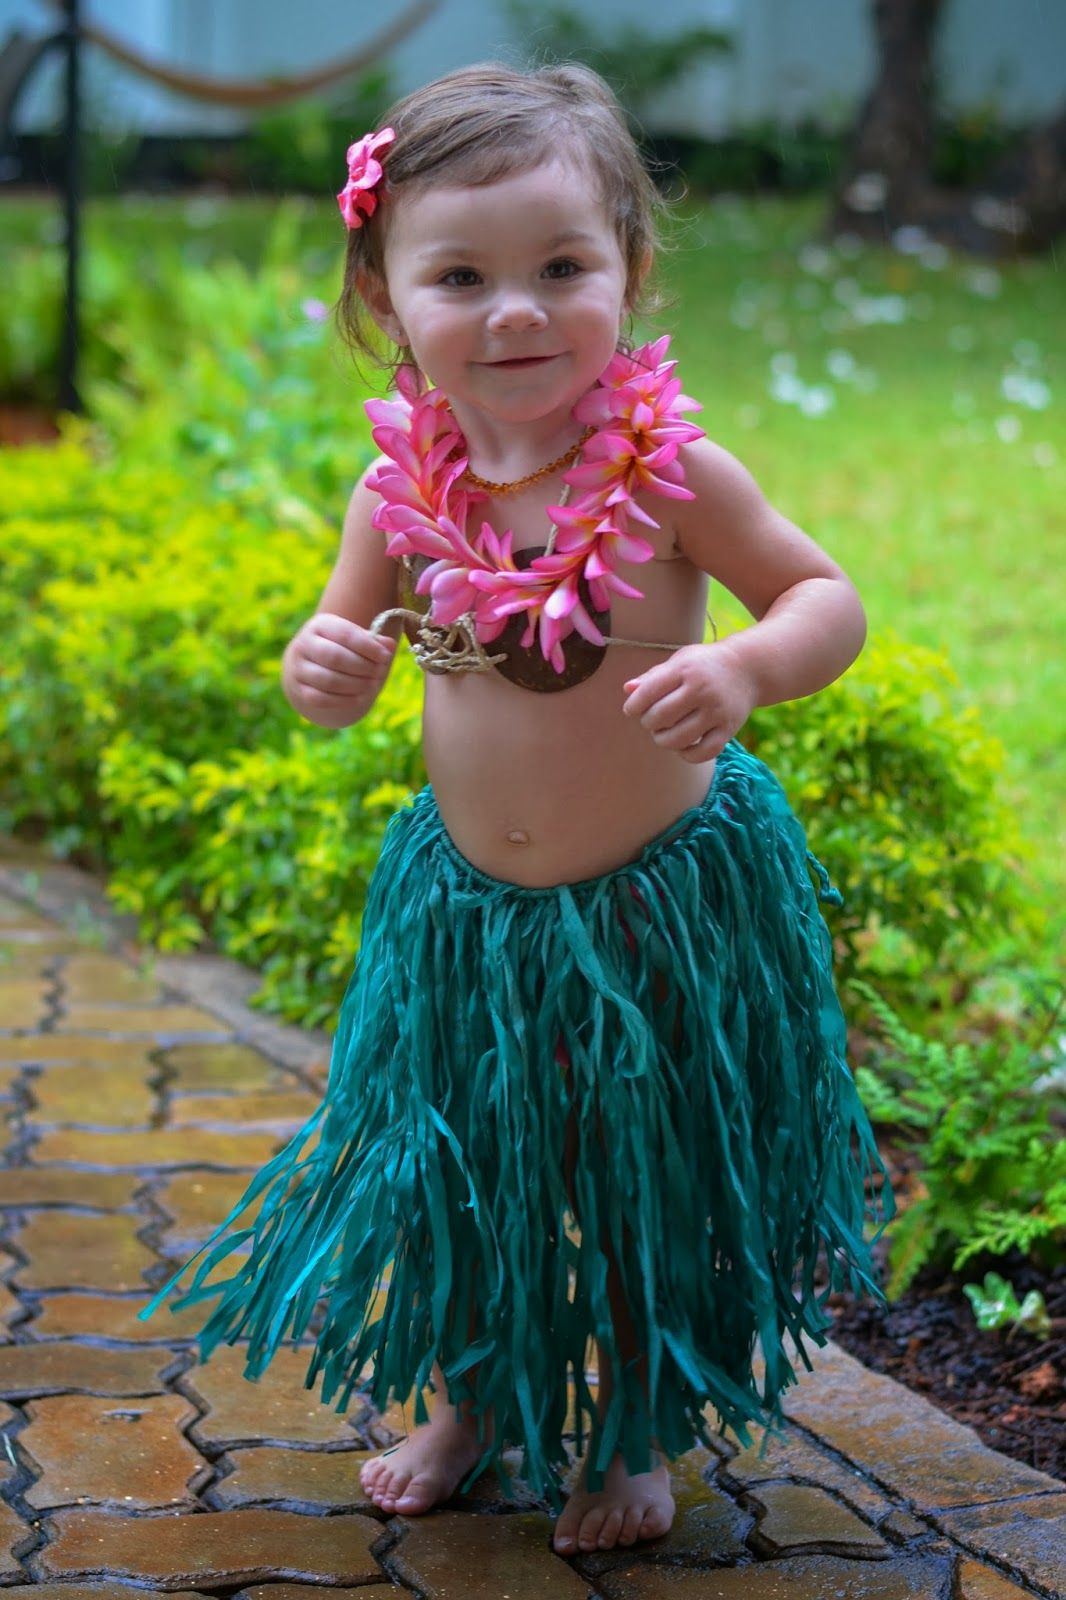 Toddler Hula Costume for Halloween  sc 1 st  Pinterest & Toddler Hula Costume for Halloween | Julia | Pinterest | Hula ...